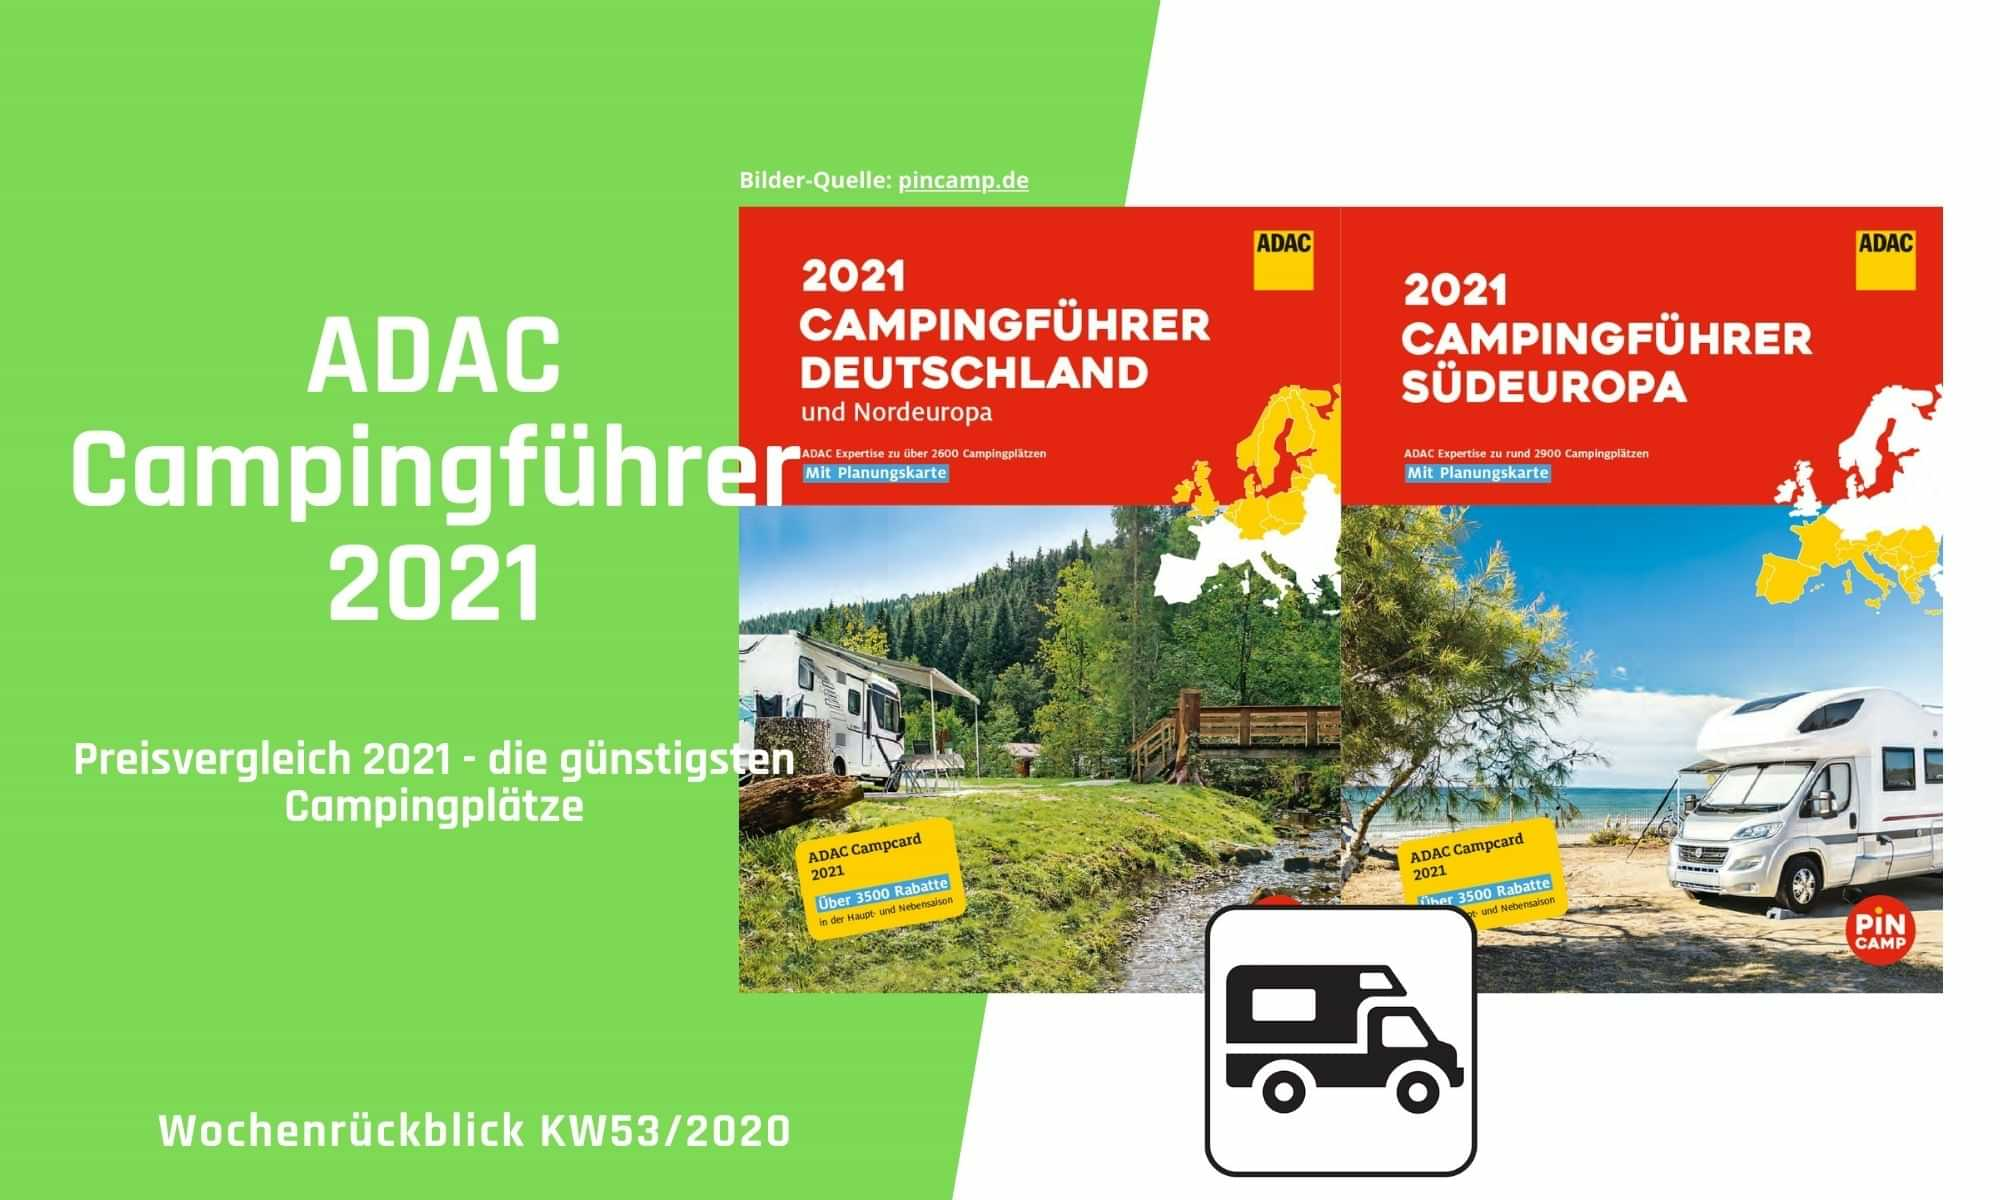 ADAC Campingführer 2021 | Camping News Wochenrückblick – KW53/2020